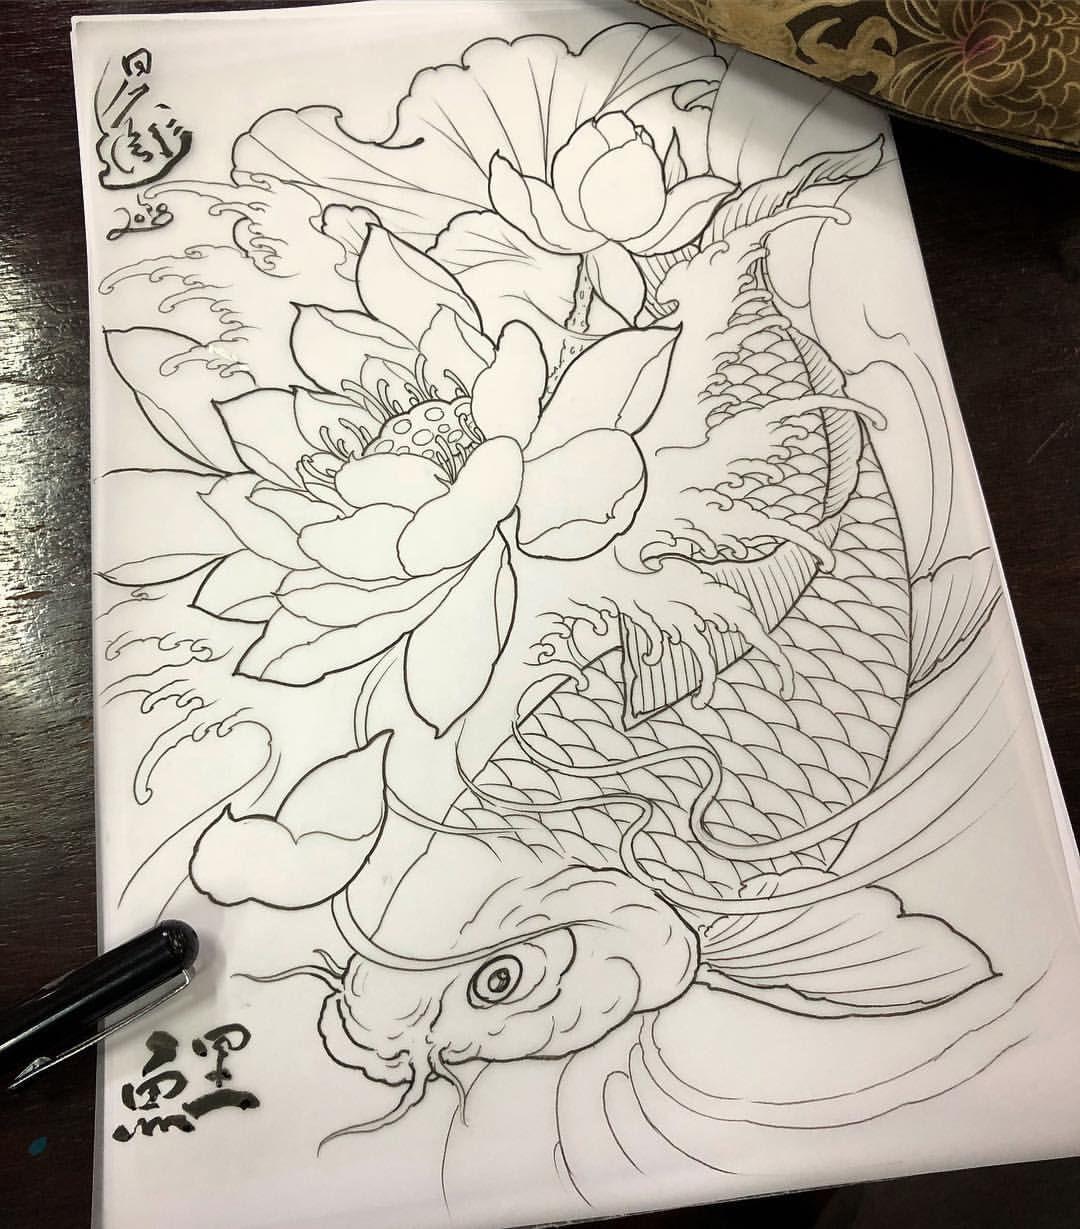 Another Day Down Galaxy Tattoo2 Redwoodtattoo Asiatattoosupply Worldfamousink Ionneedles Inkeez Japanese Tattoo Art Koi Dragon Tattoo Koi Tattoo Design